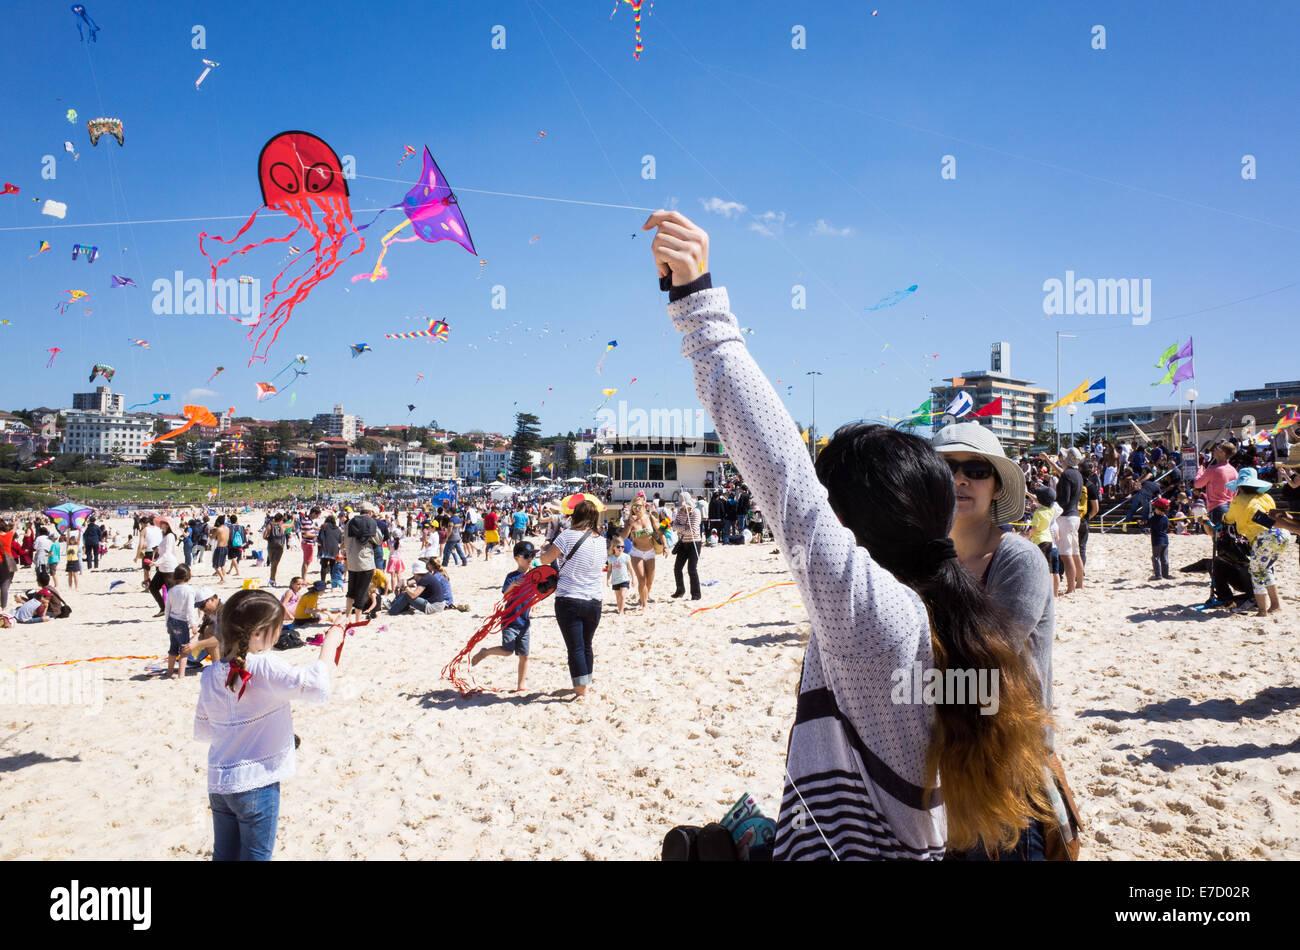 People flying kites - Stock Image